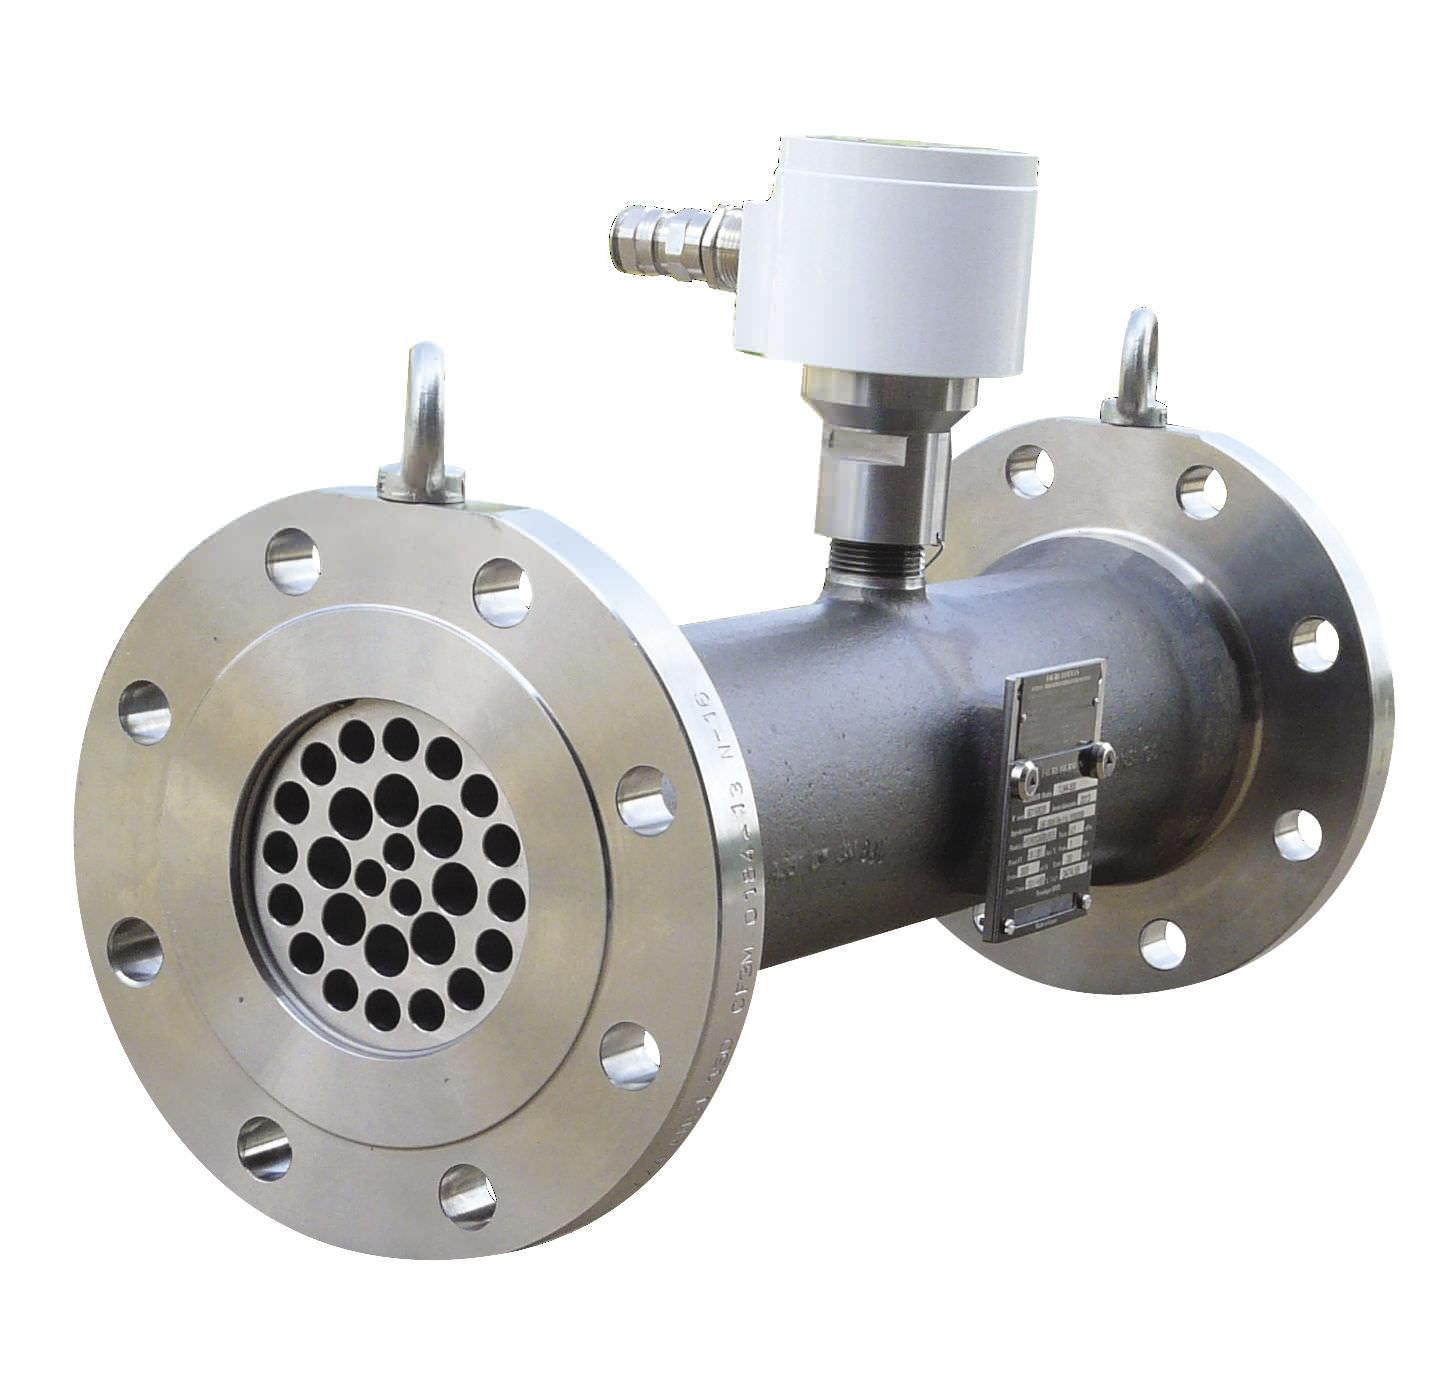 Turbine flow meter for liquids in line for custody transfer